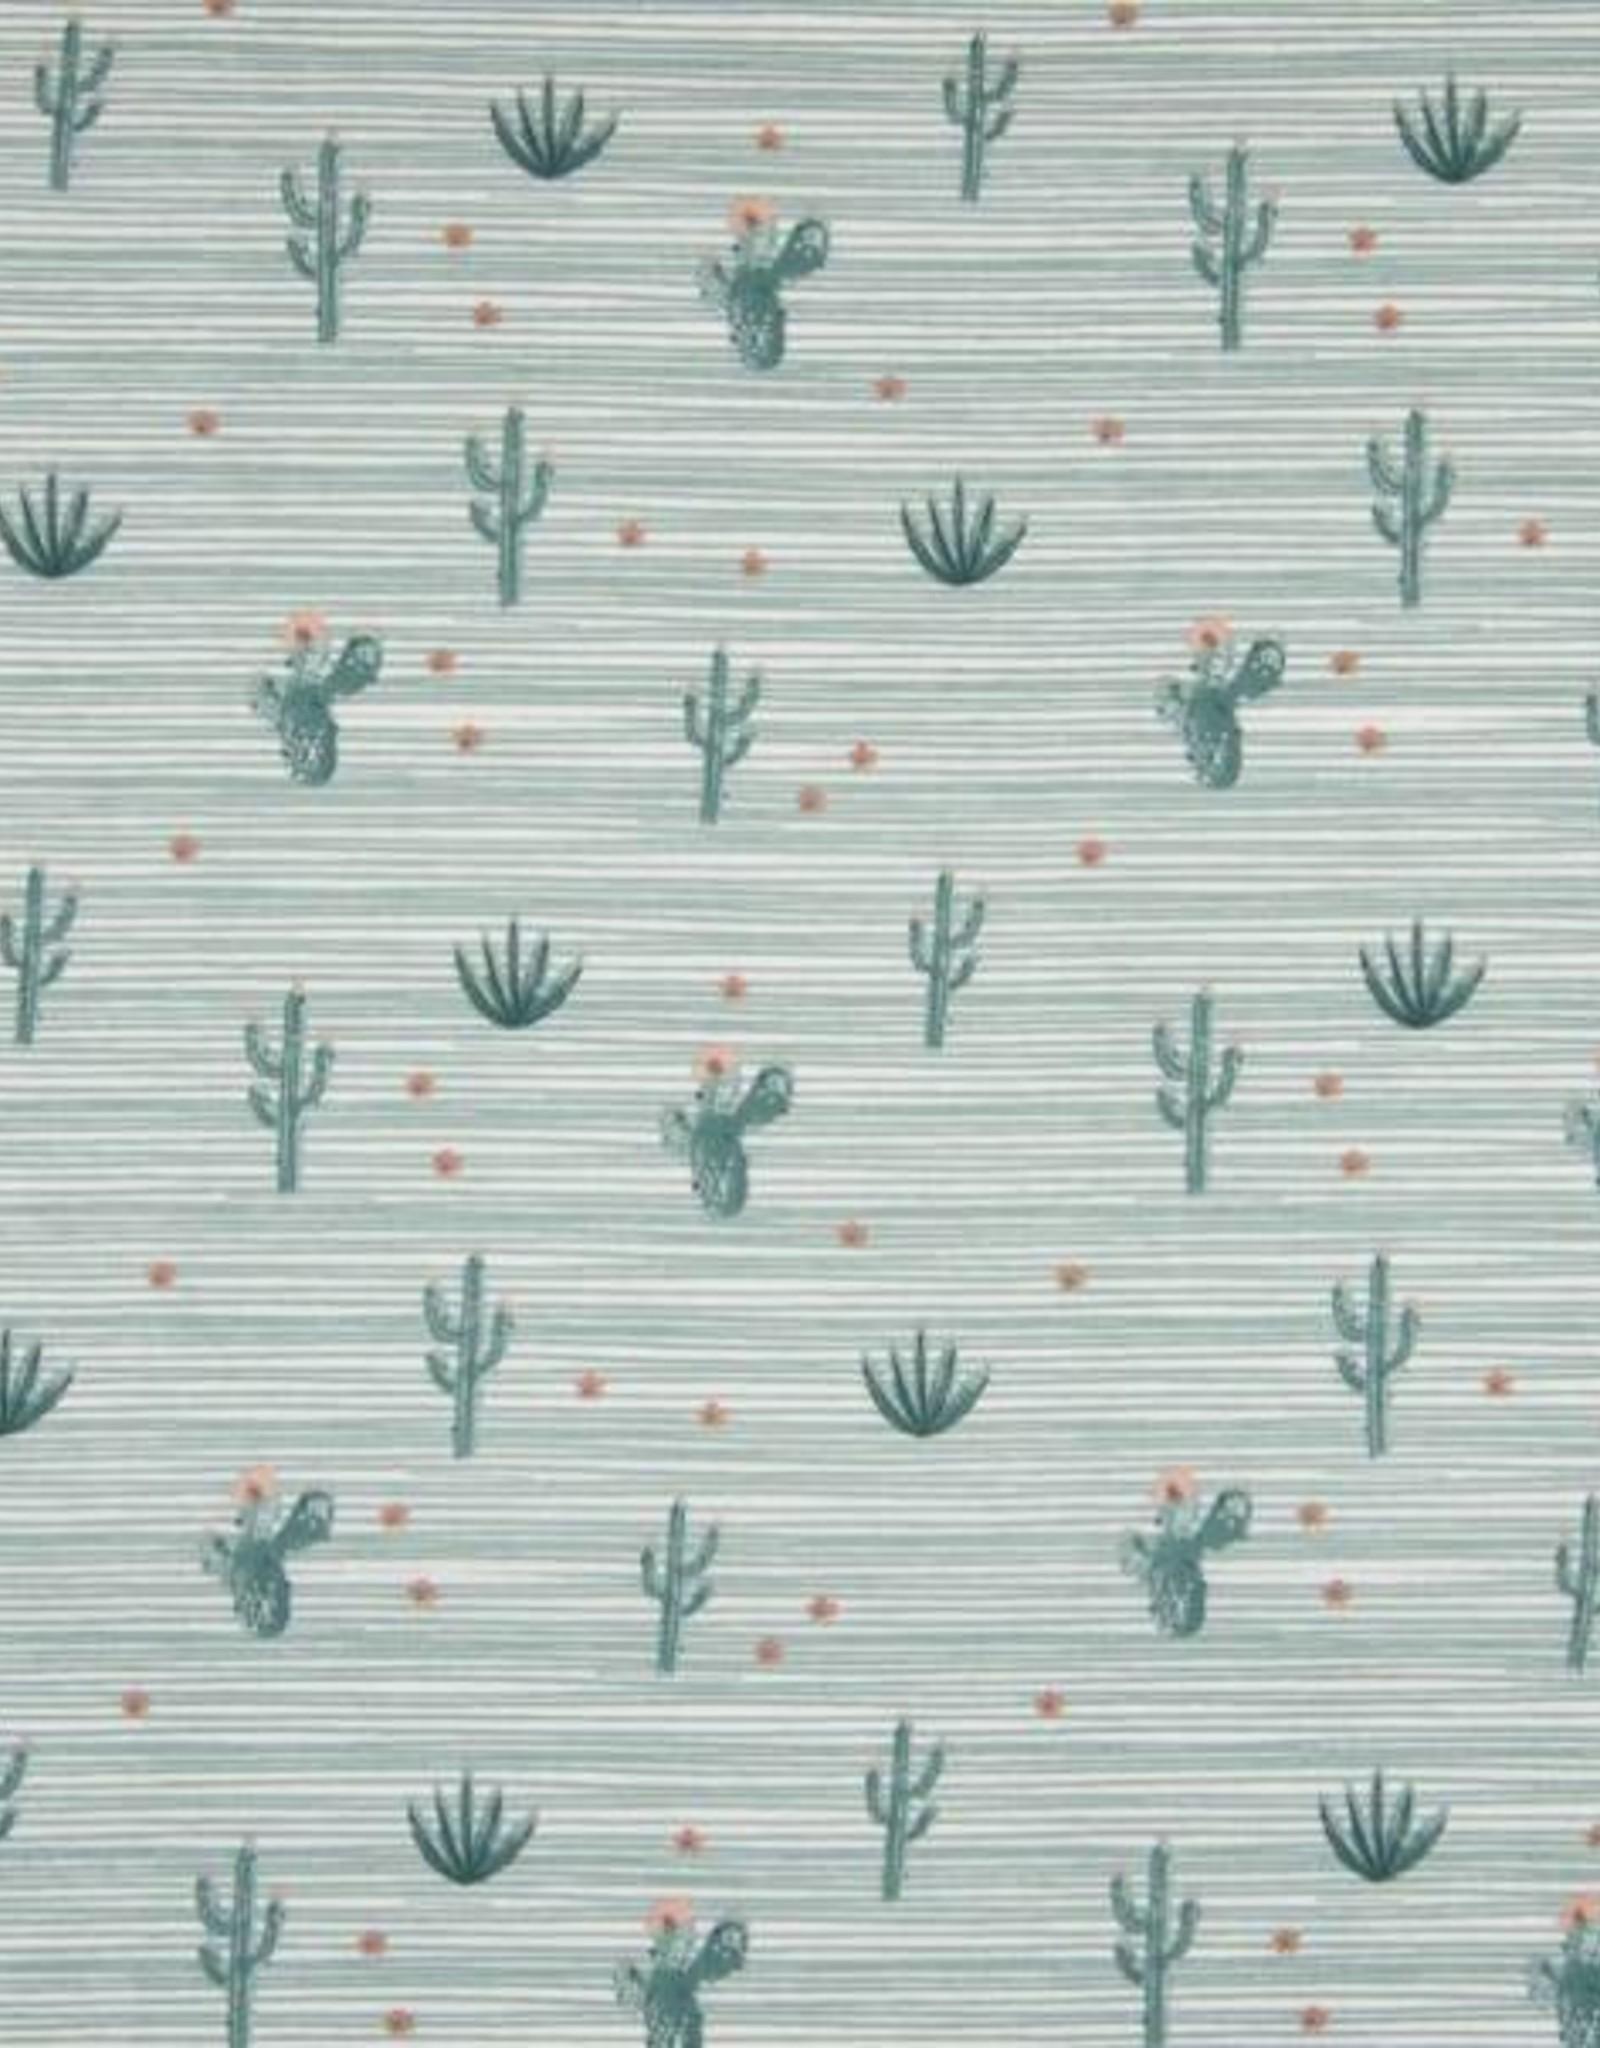 Qjutie Poplin desert and stripes munt